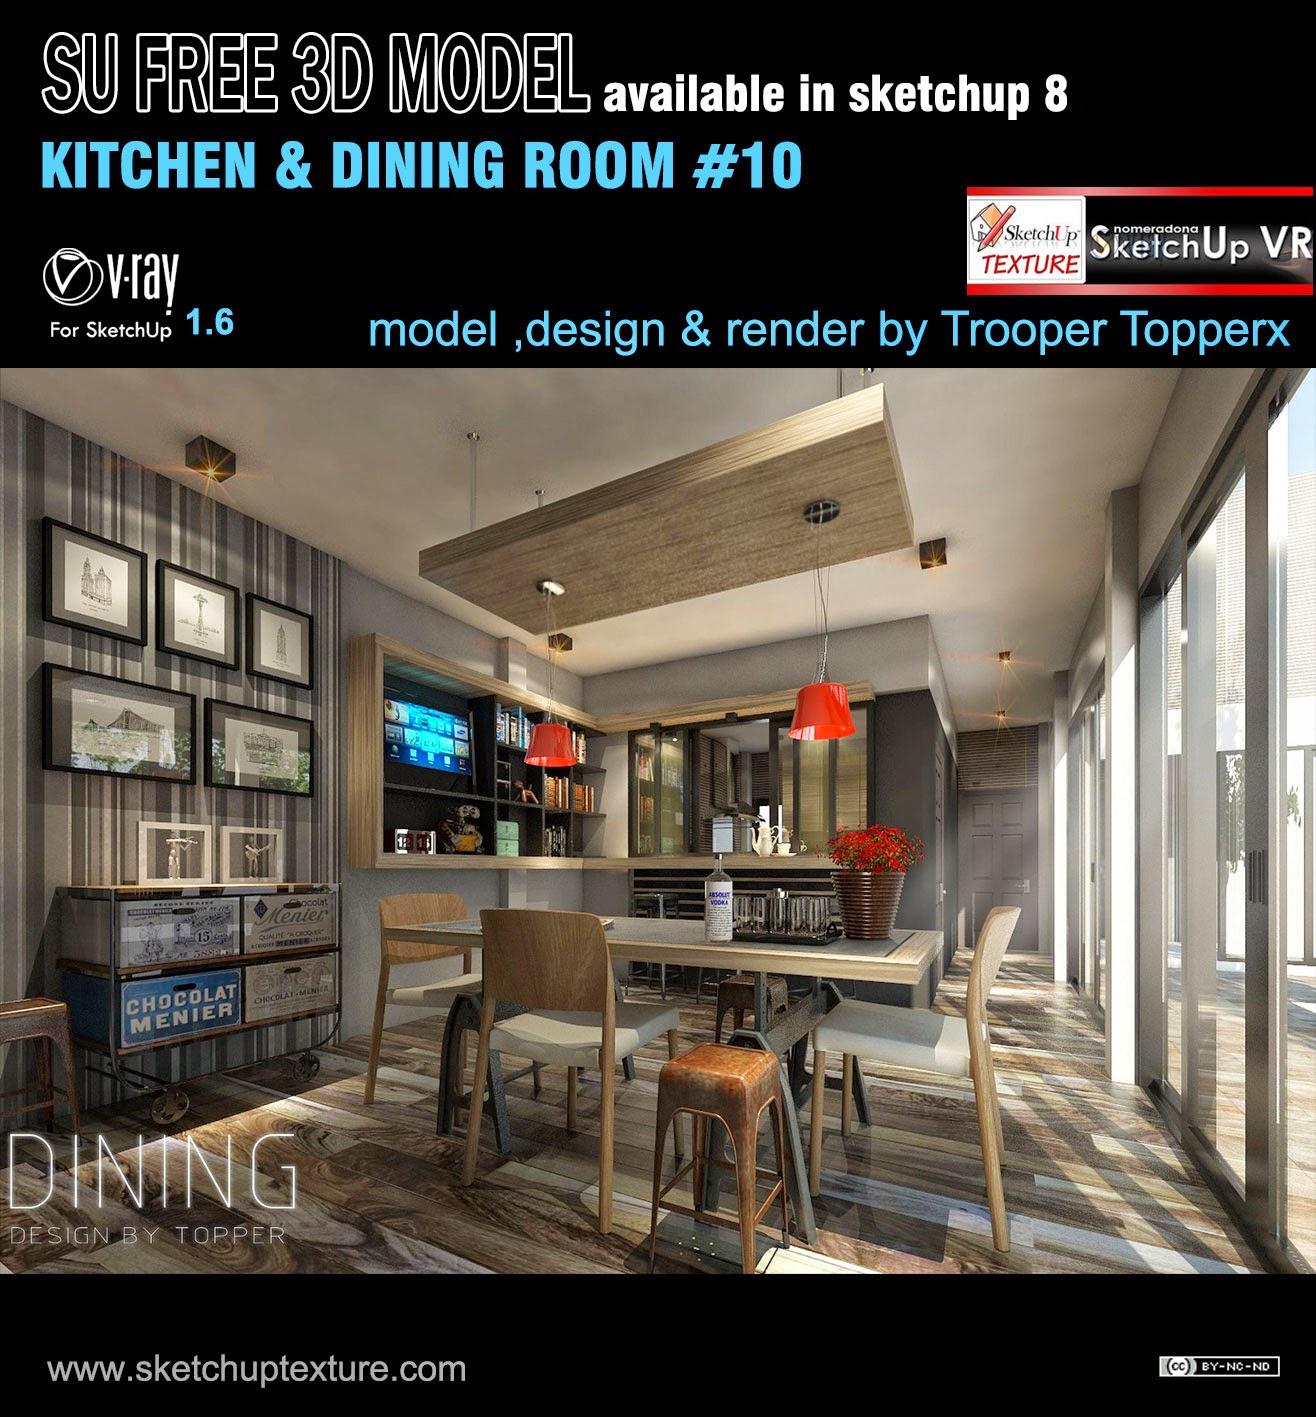 Best Free Sketchup 3d Model, Kitchen & Dining Room #10